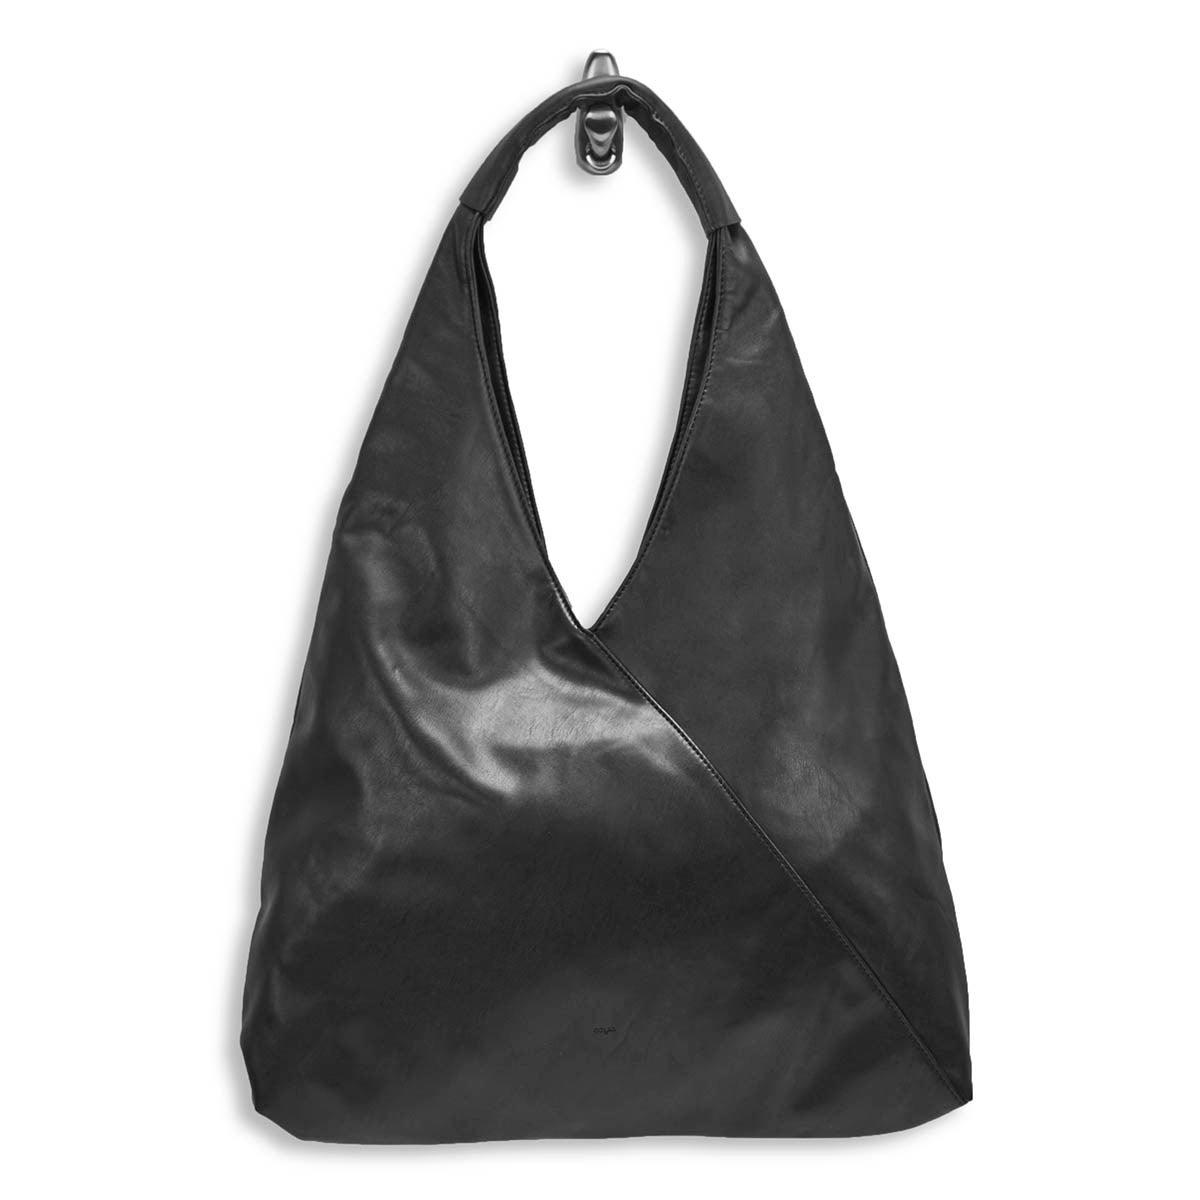 Lds Alexis black triangle hobo bag